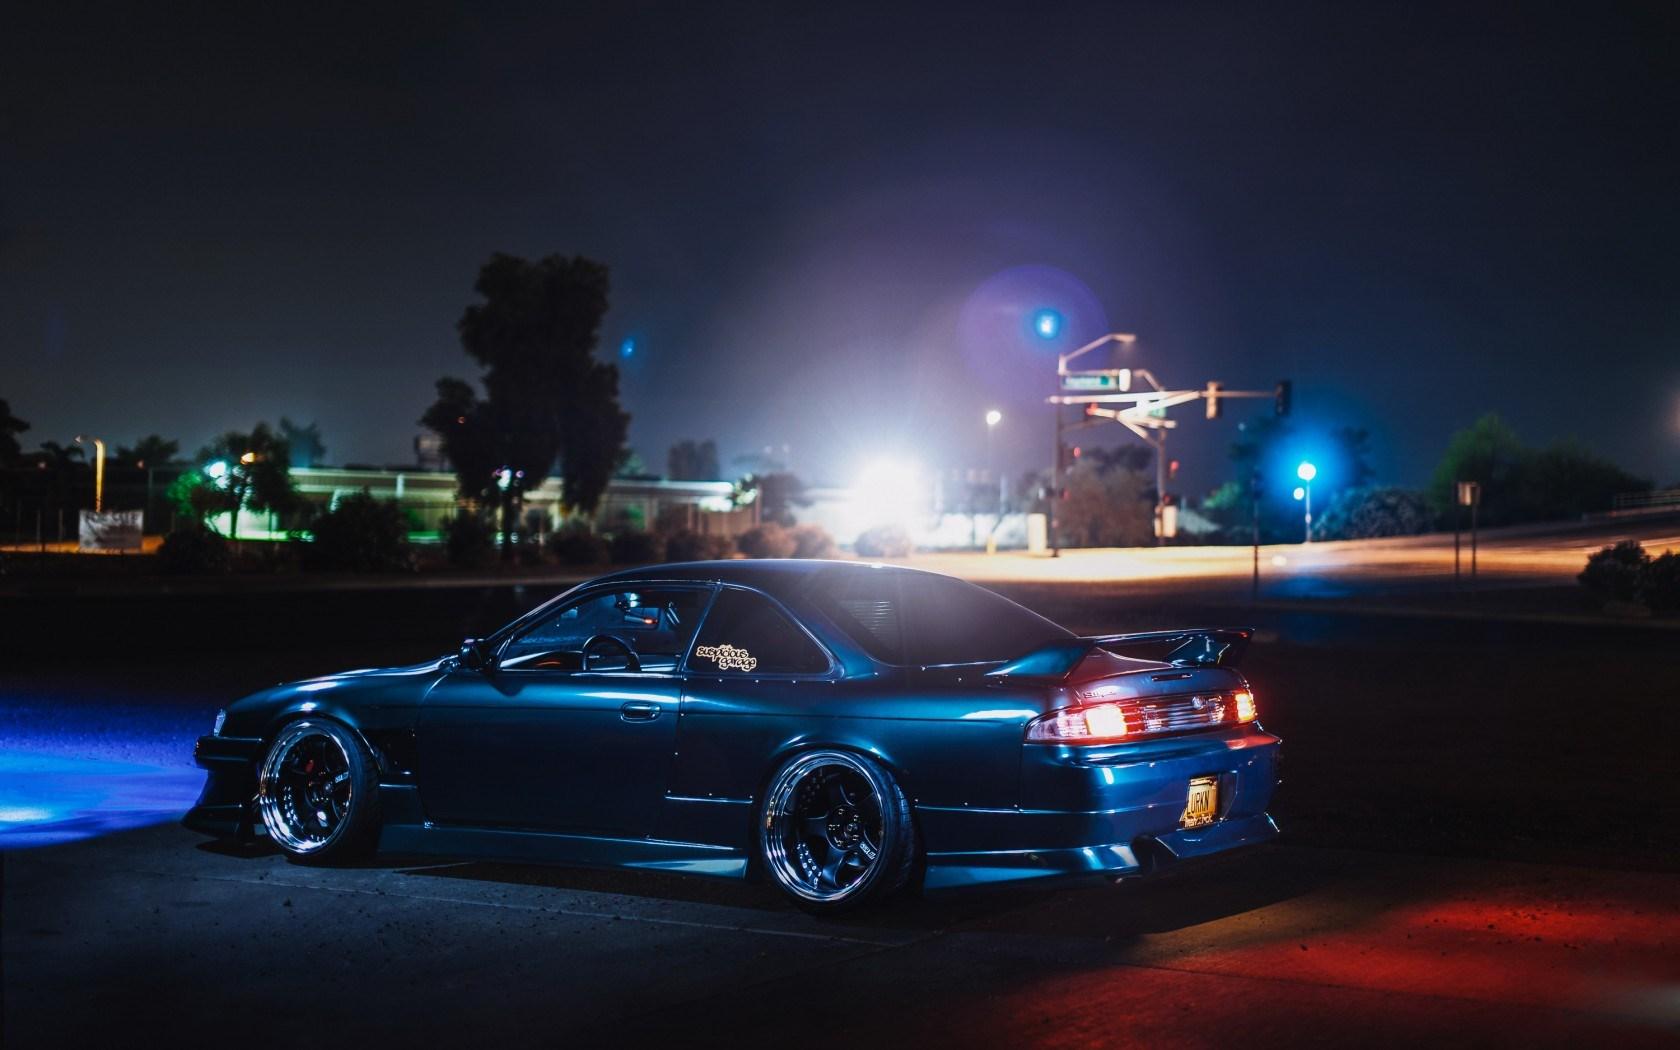 Free download HD Hintergrundbilder Nissan Silvia S14 240sx Auto